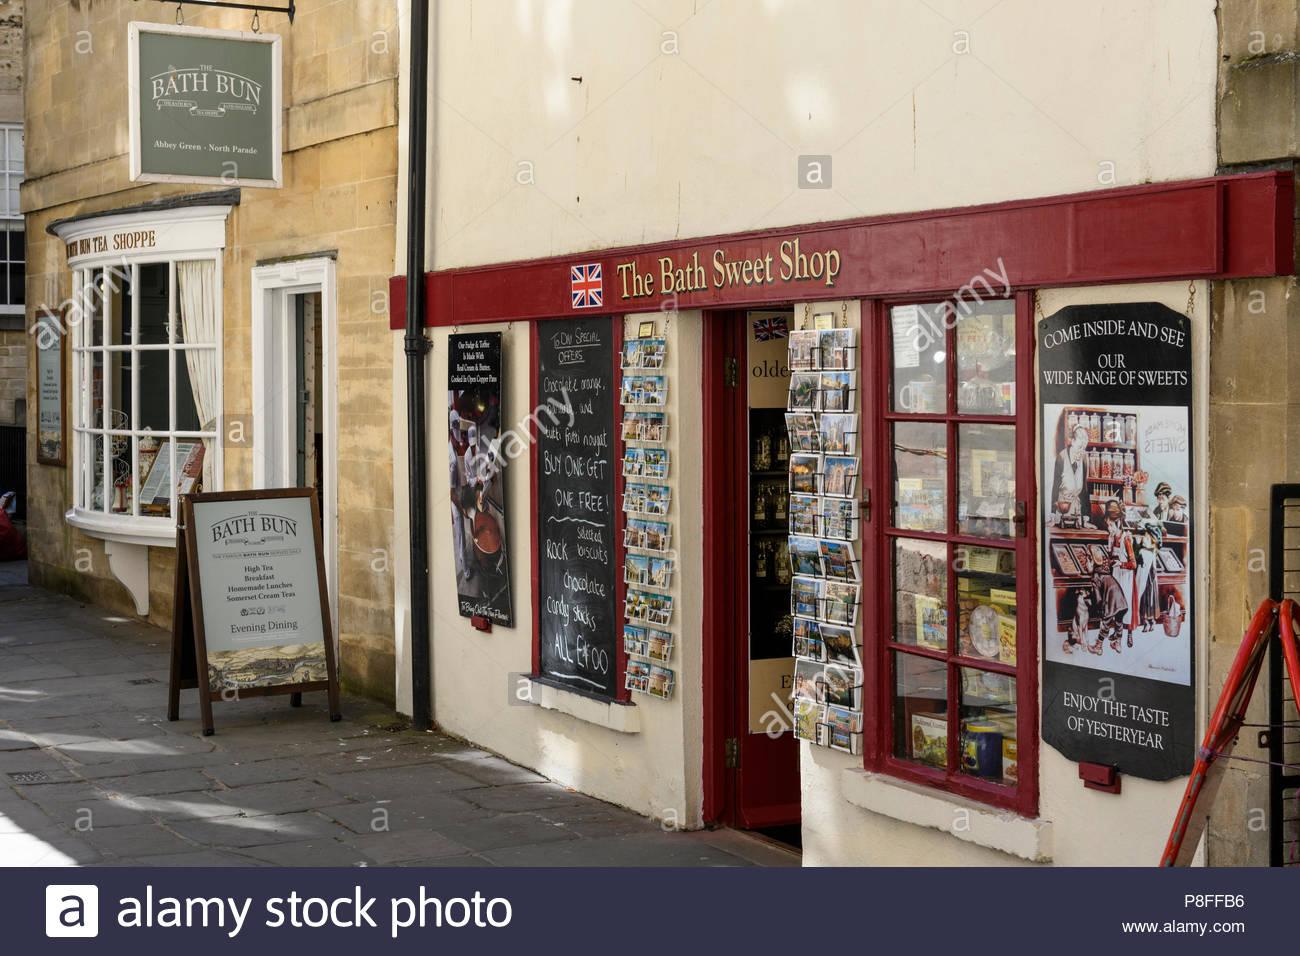 The Bath Sweet Shop, Bath, Somerset, England, UK Stock Photo